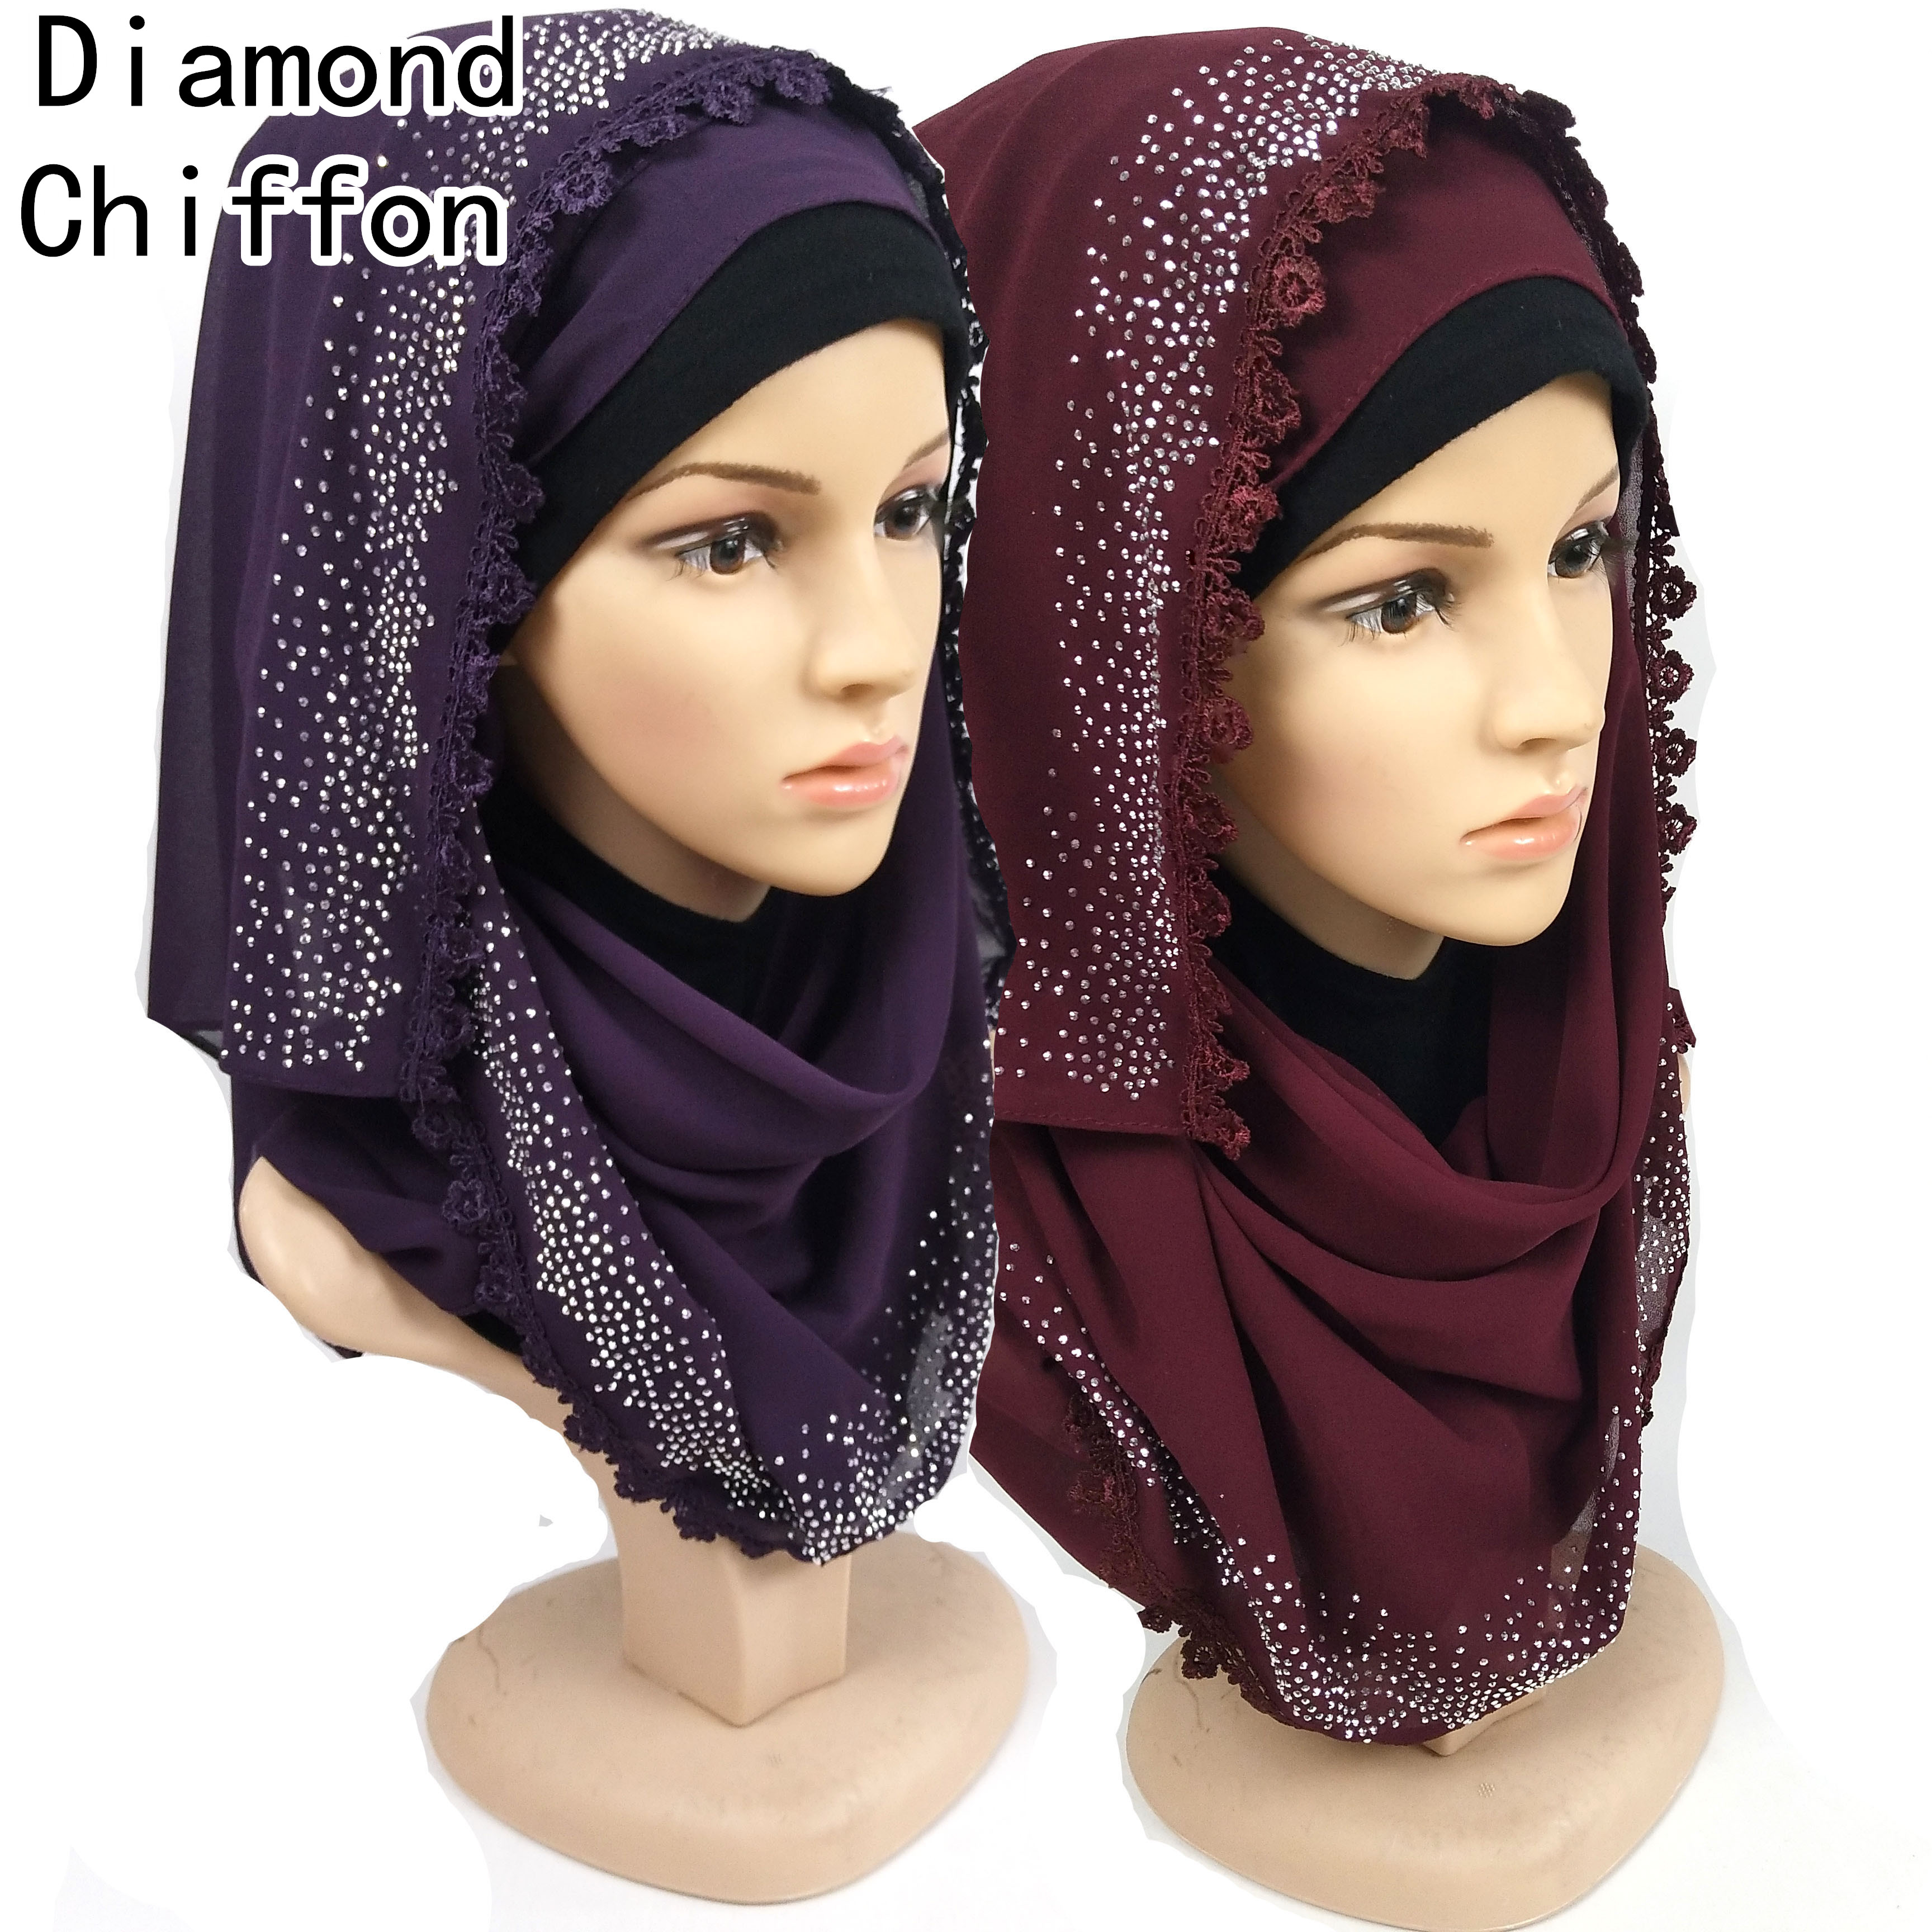 1pcs High Quality Diamond Chiffon Muslim Hijab Scarf/scarves Shawl Long Wrap Headband Can Choose Colors 180*75cm